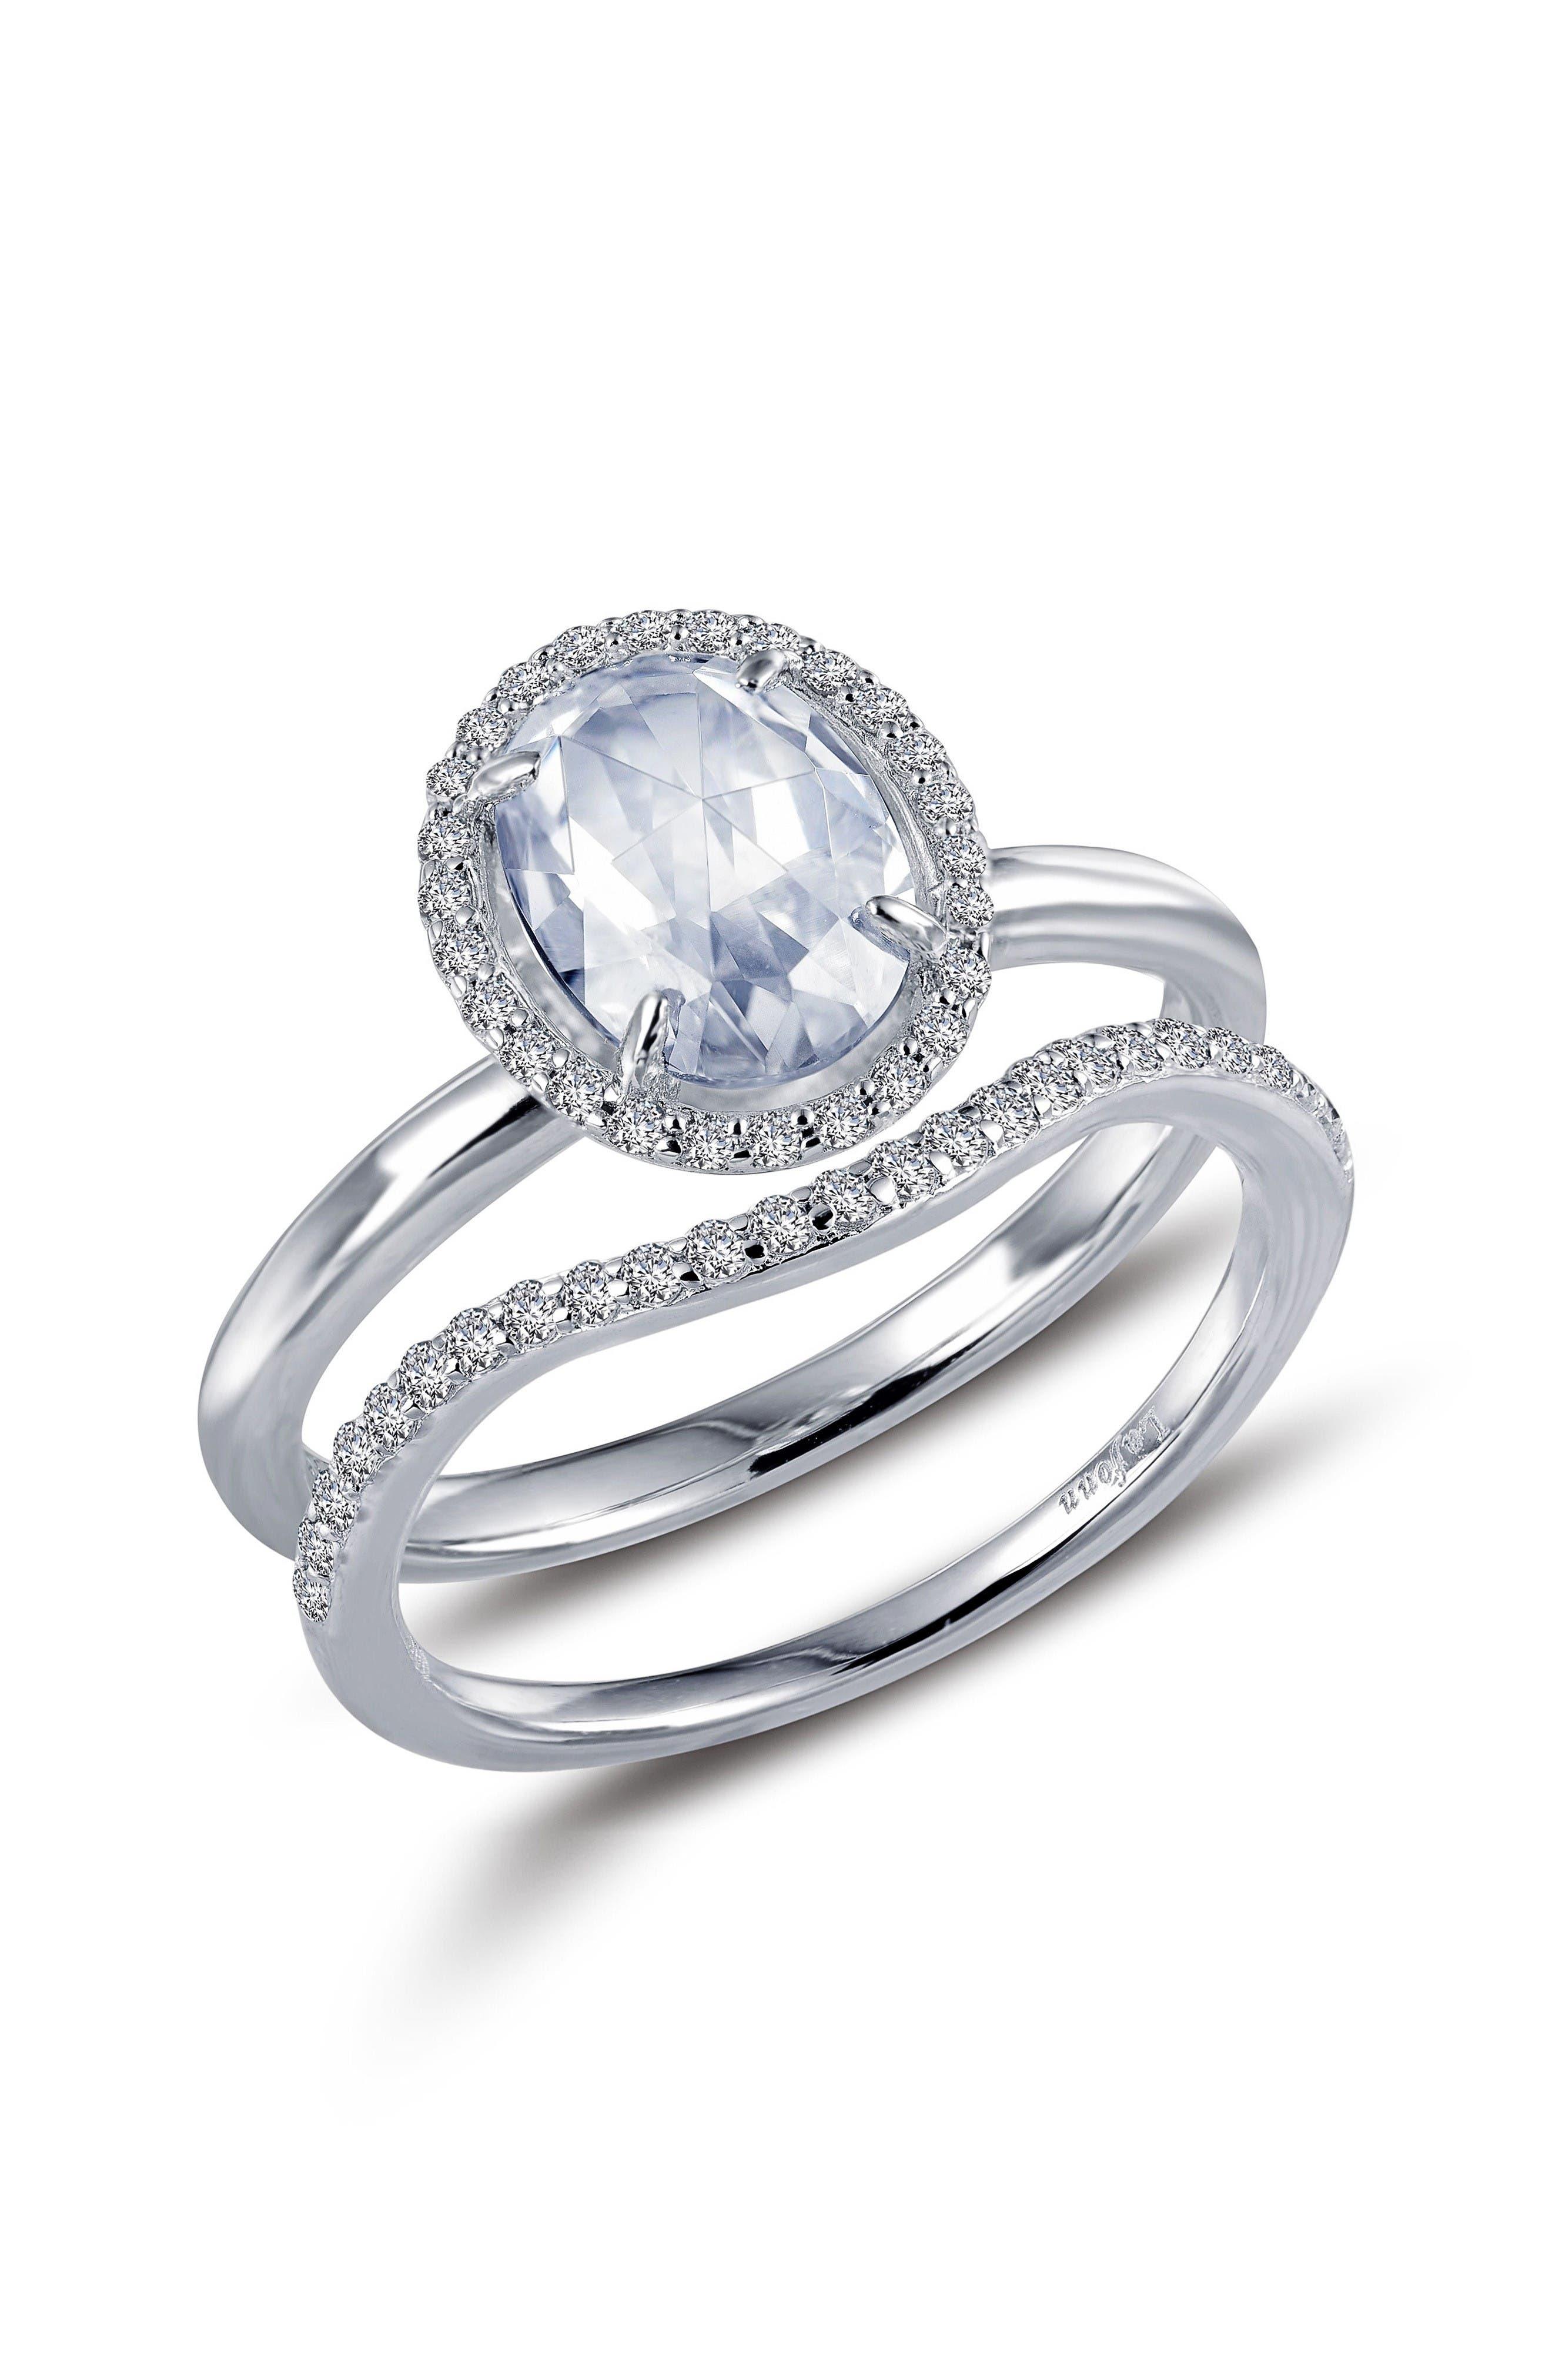 Main Image - Lafonn Rose Cut Simulated Diamond Ring